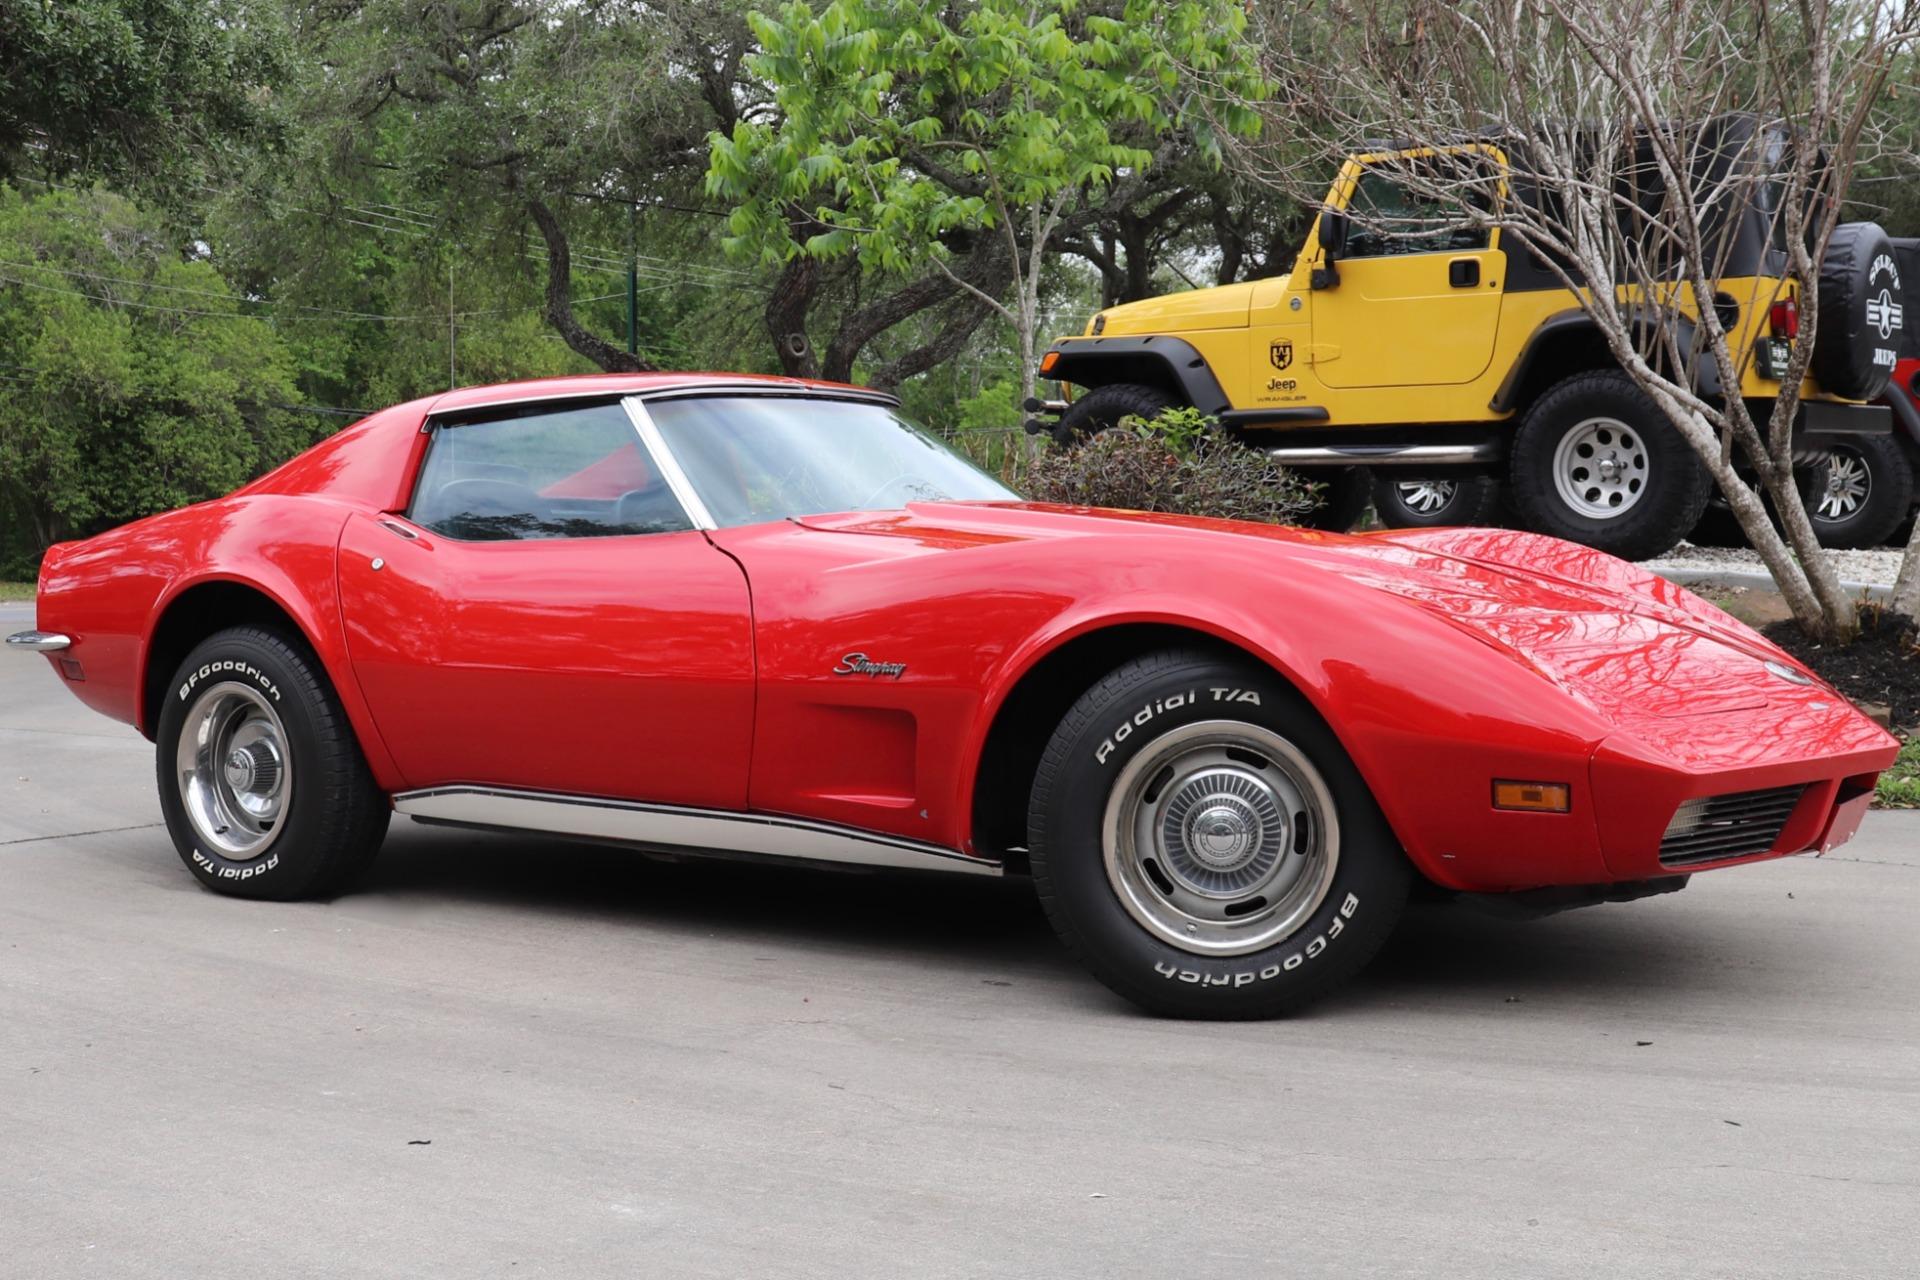 Used-1973-Corvette-Stingray